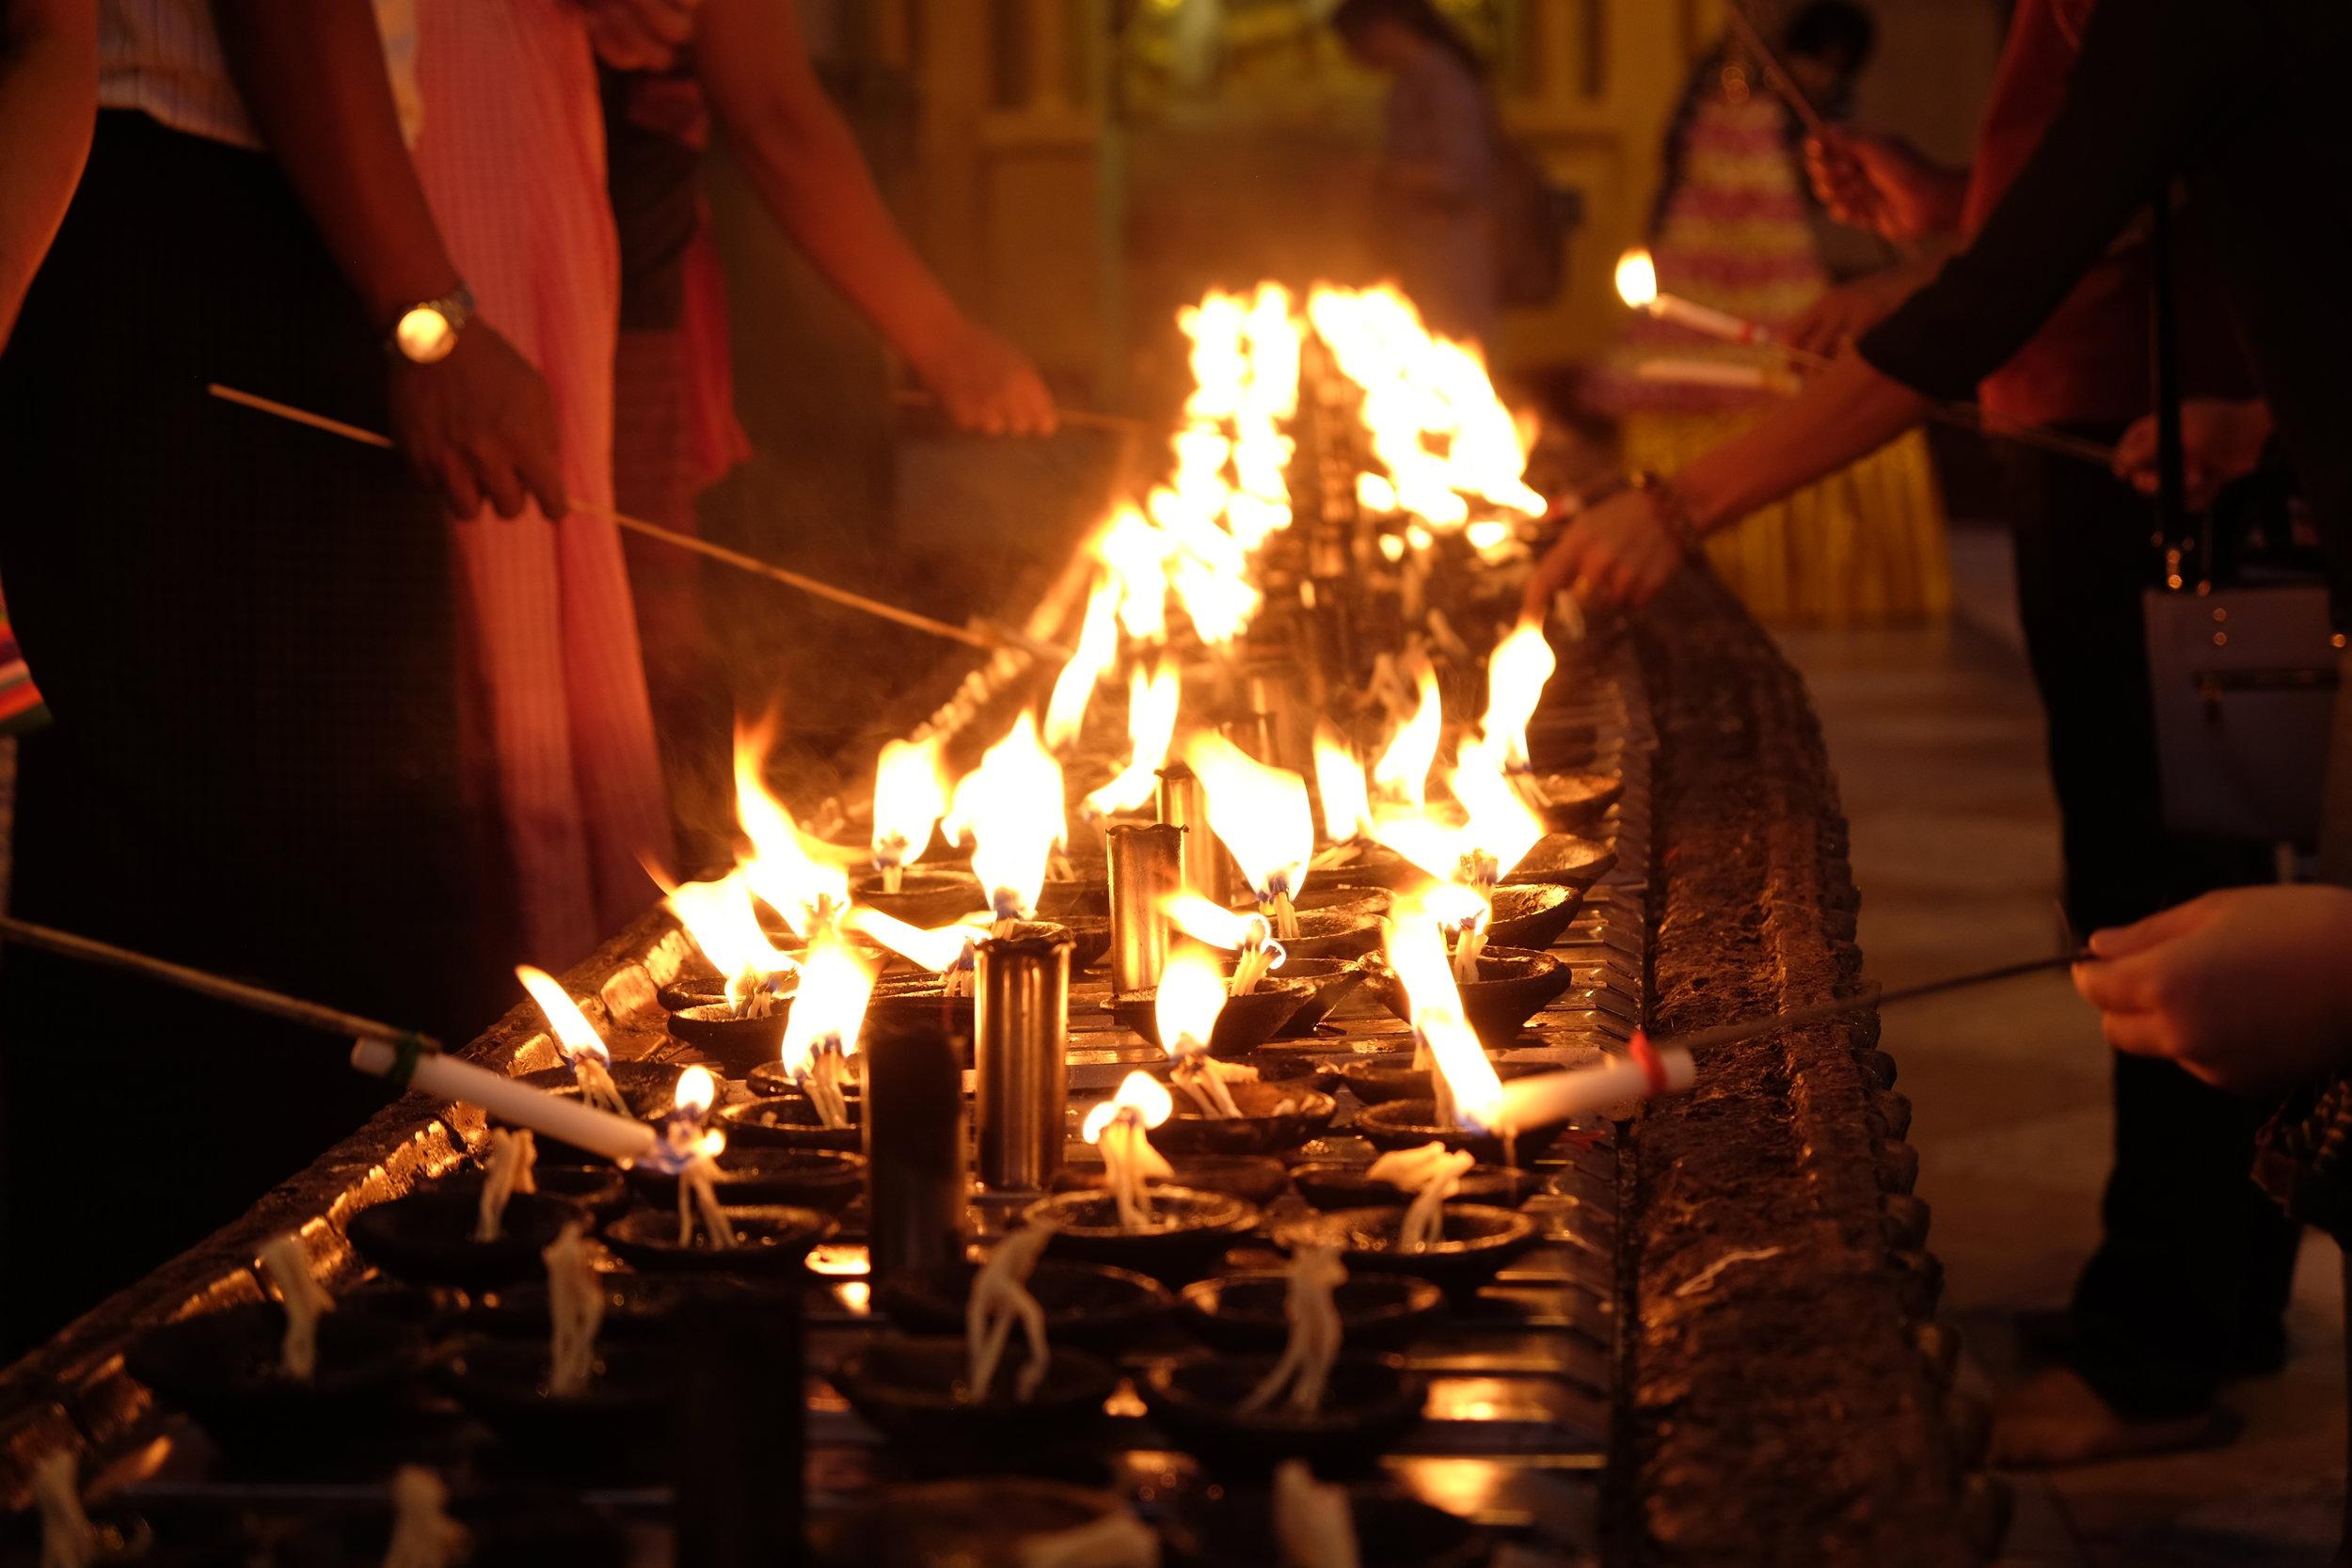 Faithful lighting votives after sunset